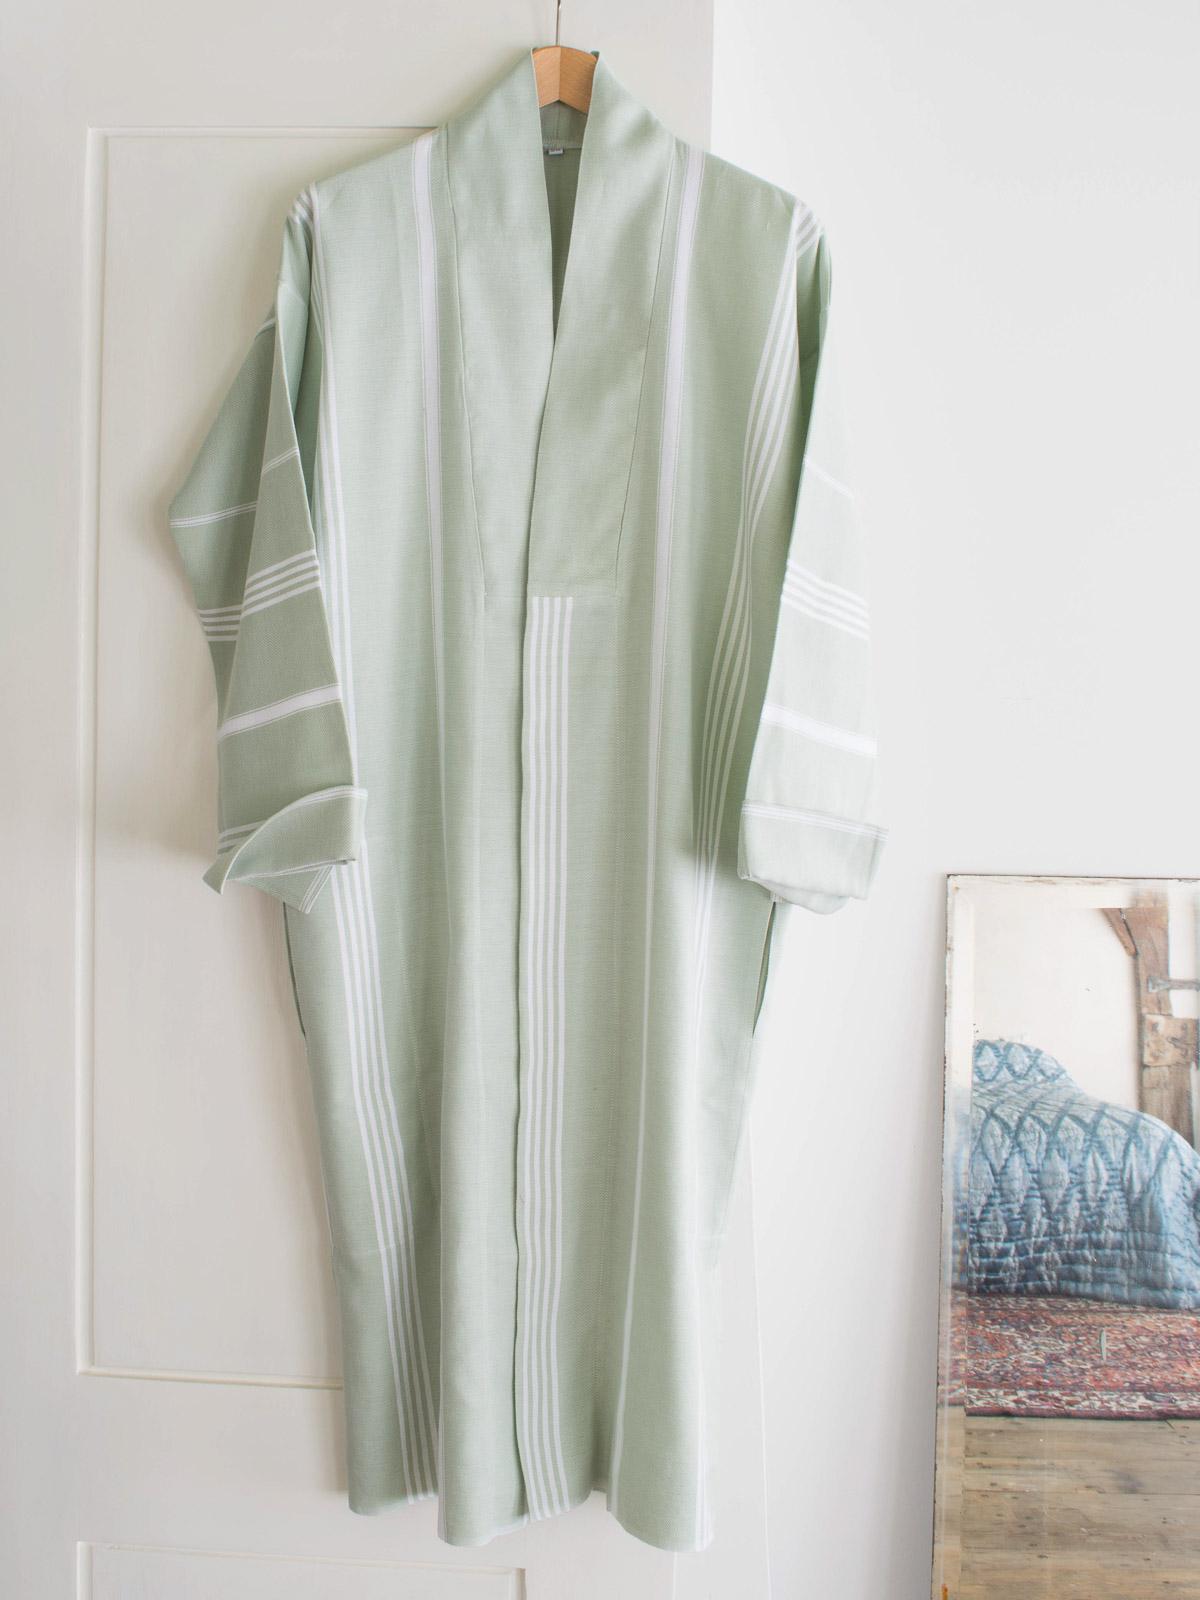 4faa493aa05 hammam bathrobe size S, sage green - hammam towel bathrobe size S -  bathrobes - slippers - Ottomania.nl | Official Ottomania Site